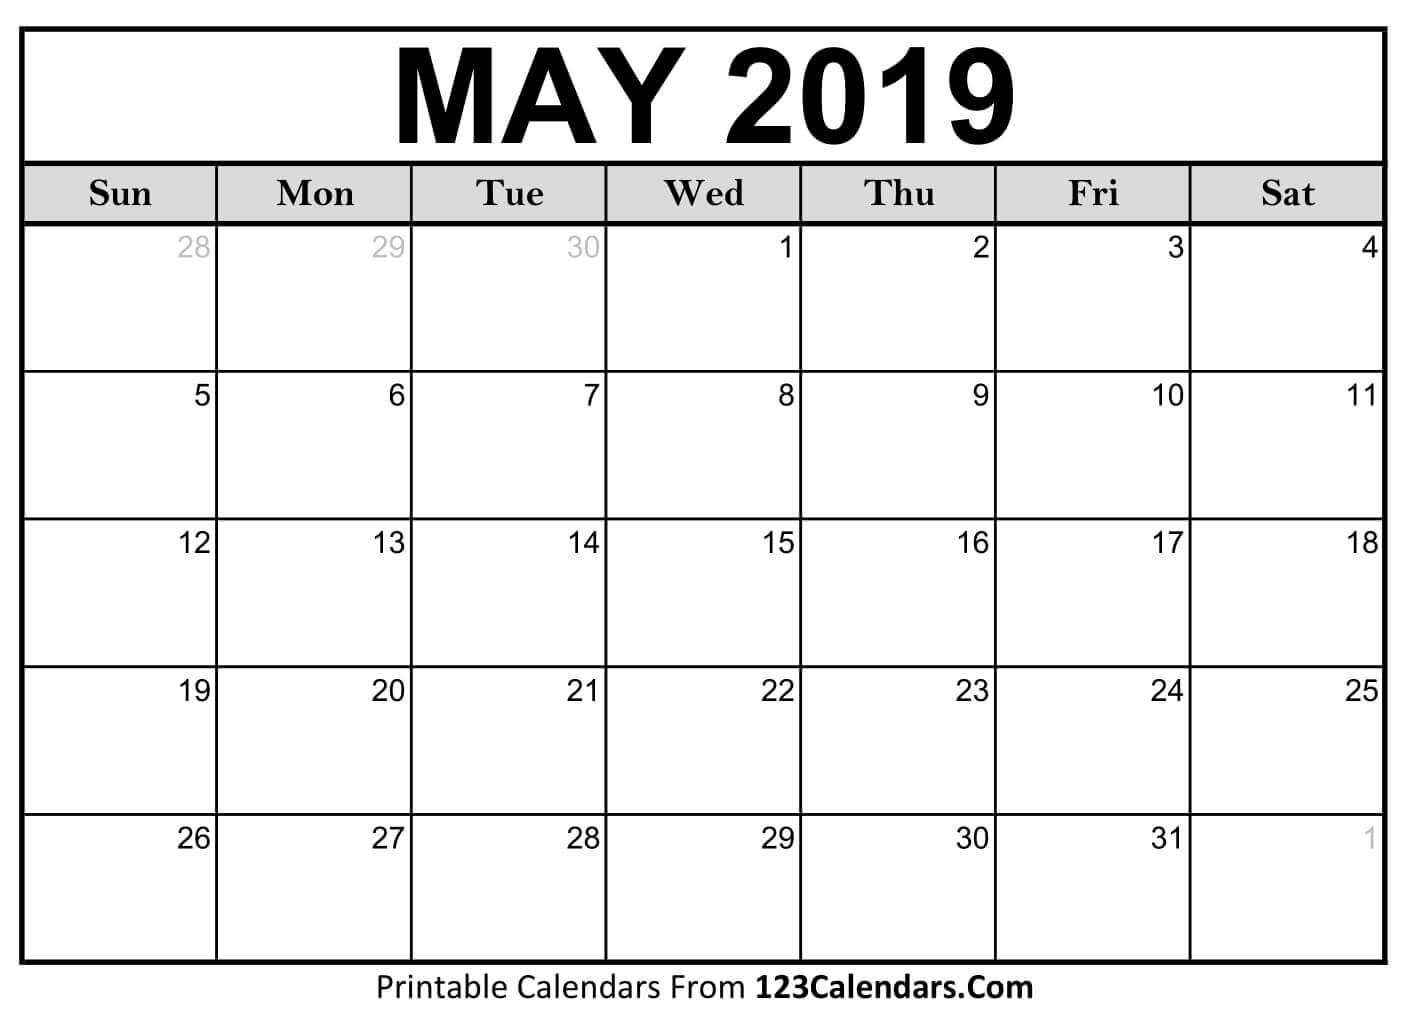 Printable May 2019 Calendar Templates - 123Calendars May 1 2019 Calendar